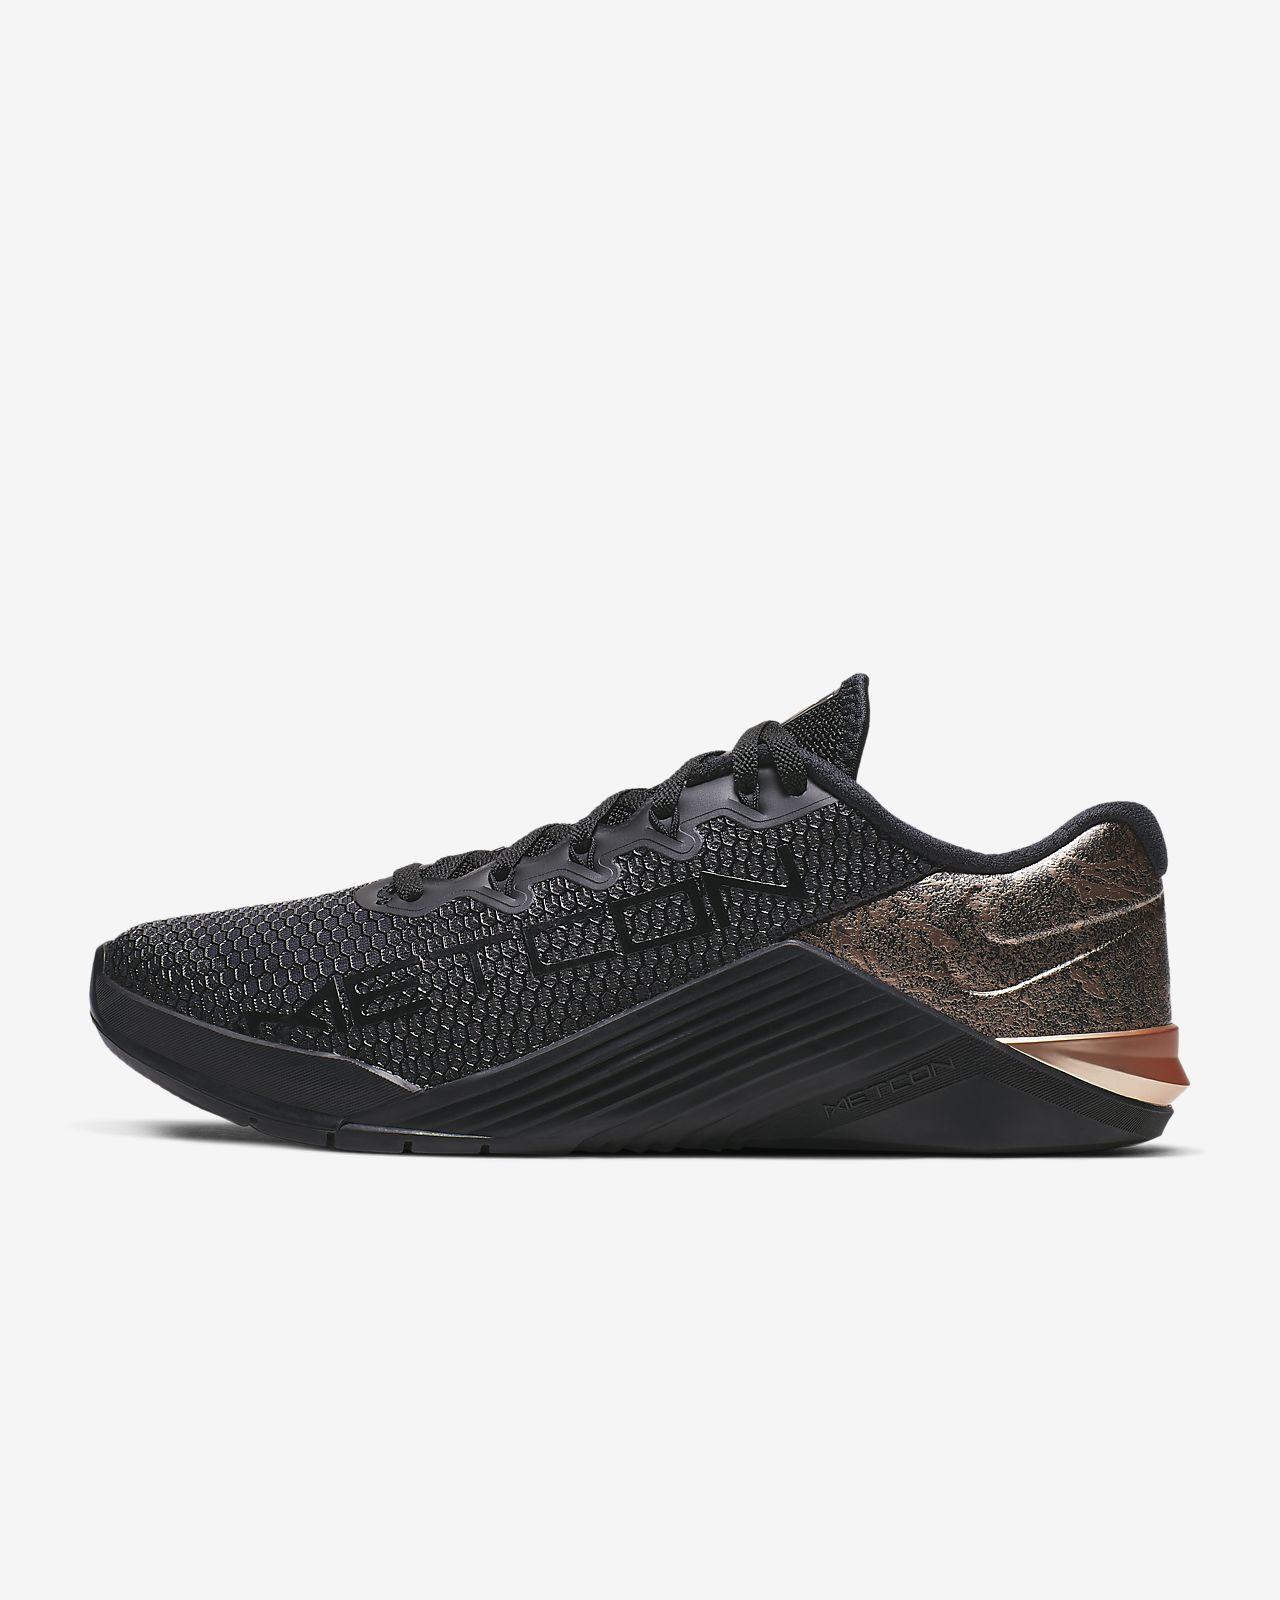 Damskie buty treningowe Nike Metcon 5 Black x Rose Gold